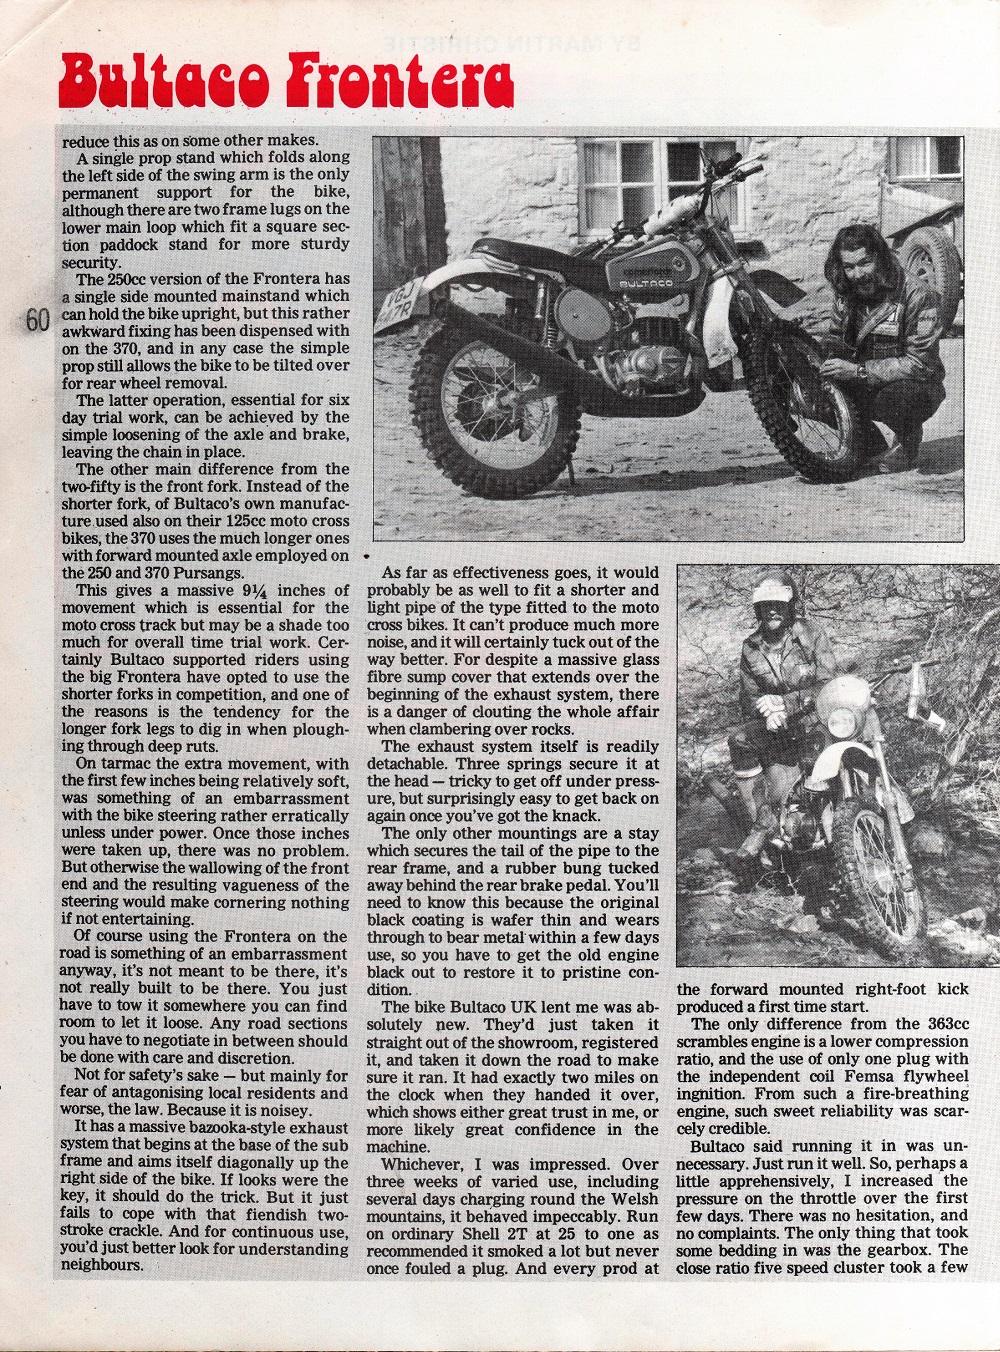 1977 Bultaco 370 Frontera road test.3.jpg